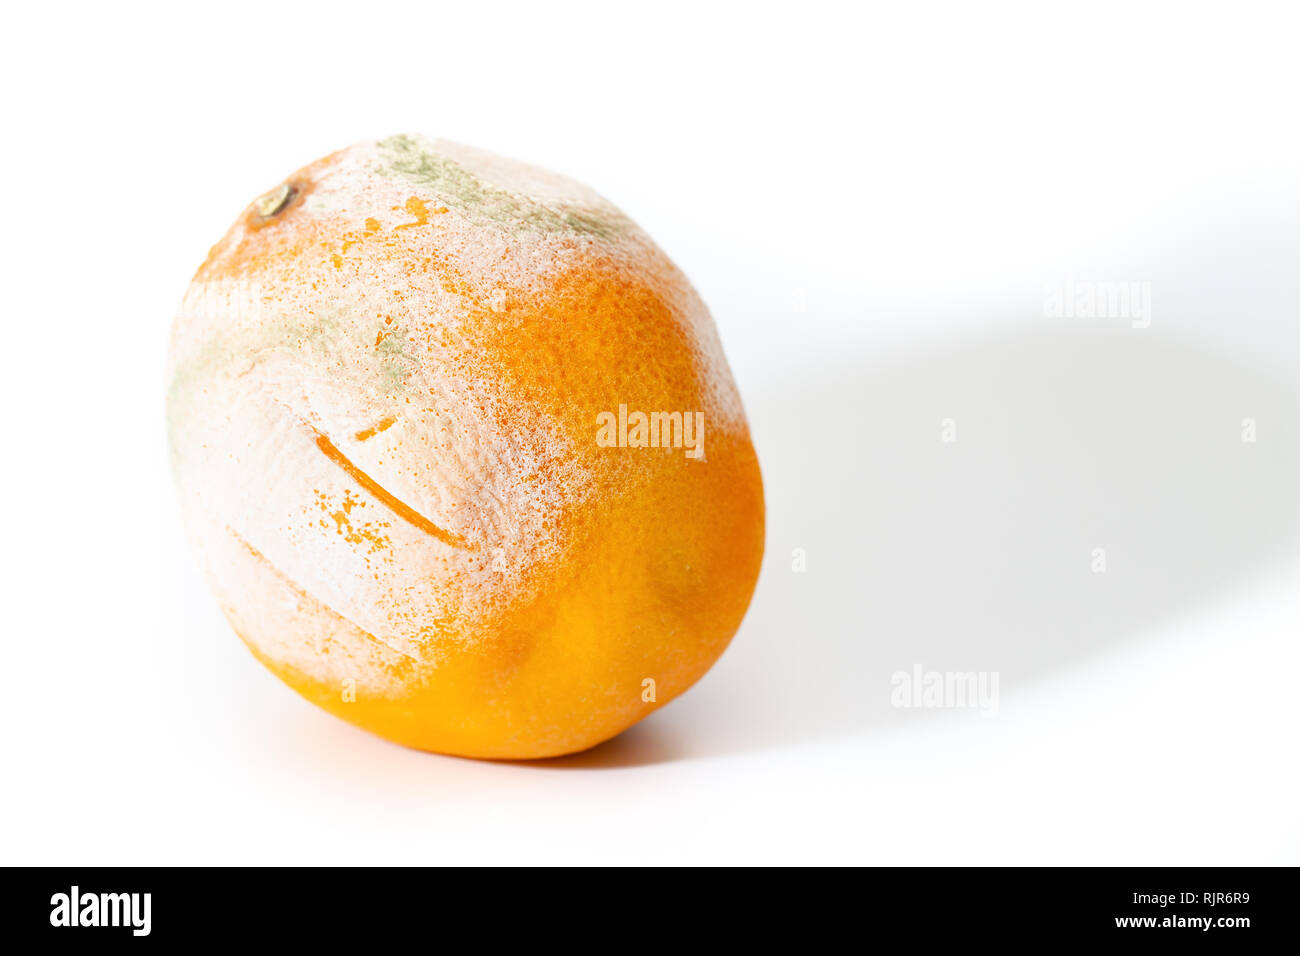 Spoiled orange with mold, on white background - Stock Image